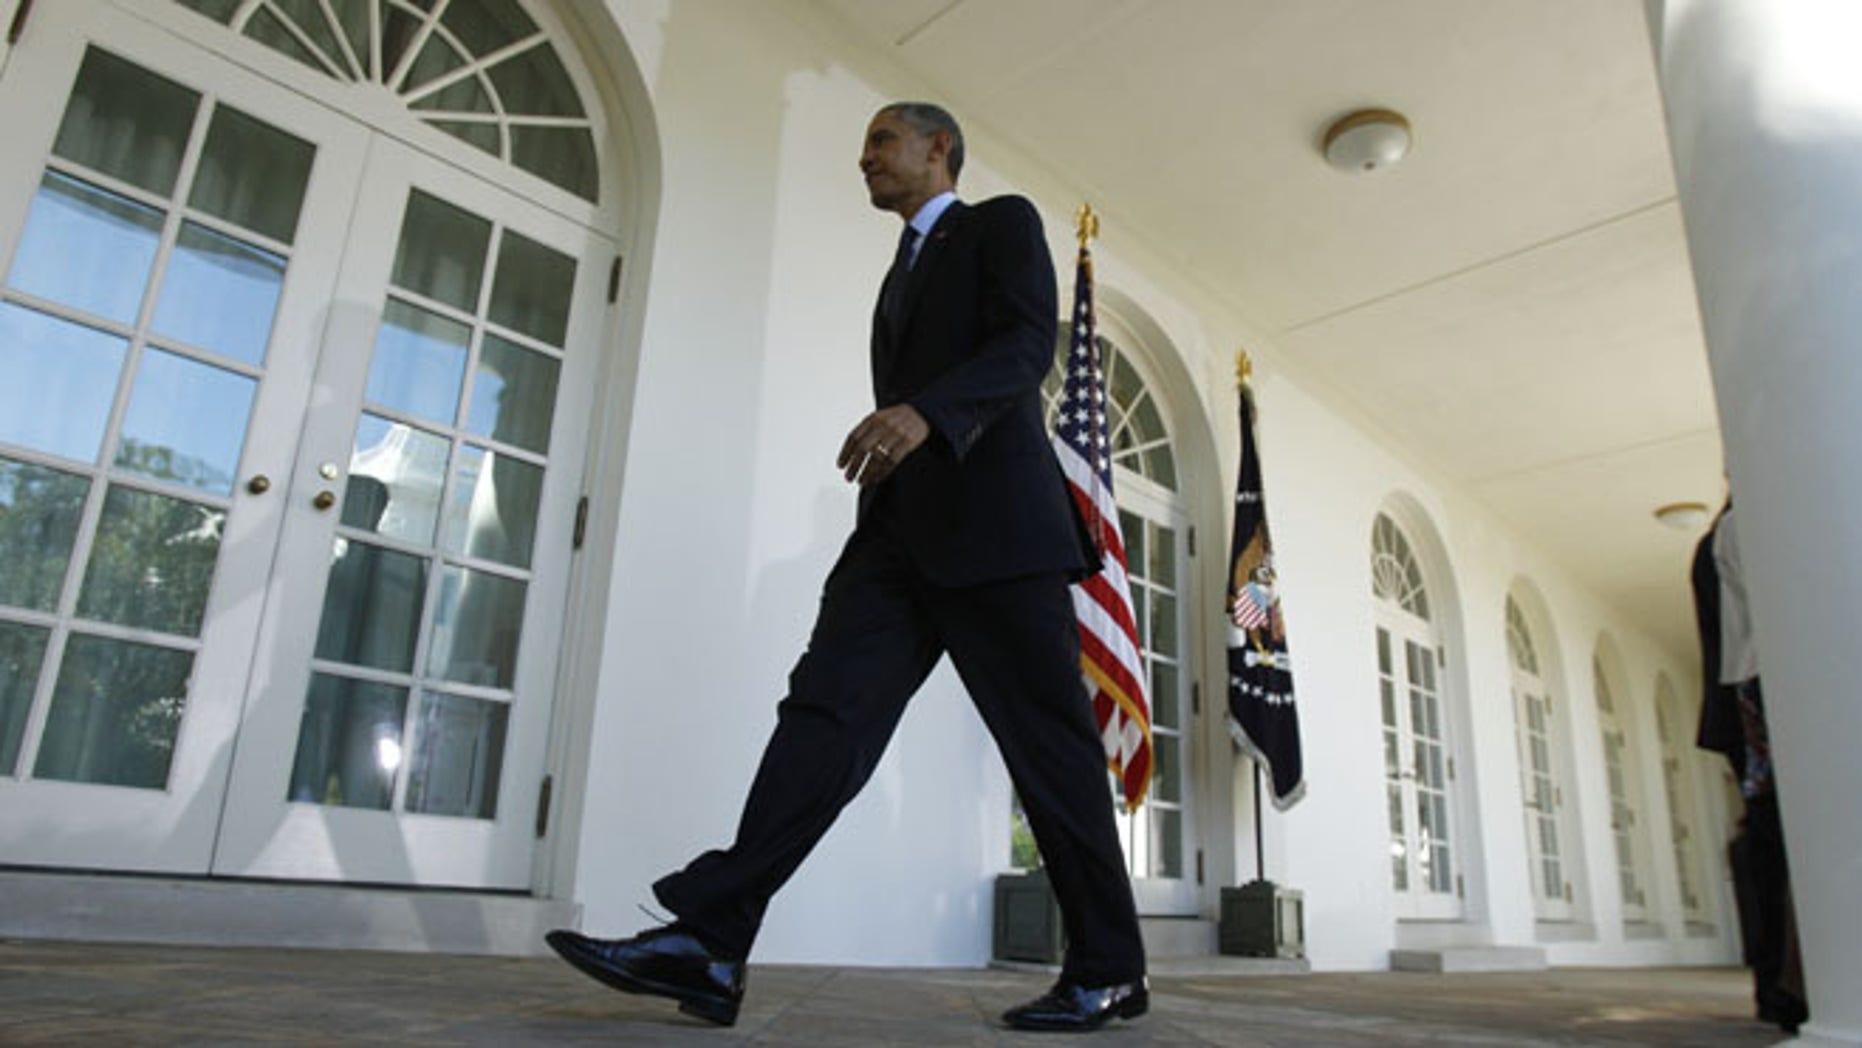 U.S. President Barack Obama departs the Rose Garden of the White House in Washington October 21, 2013.